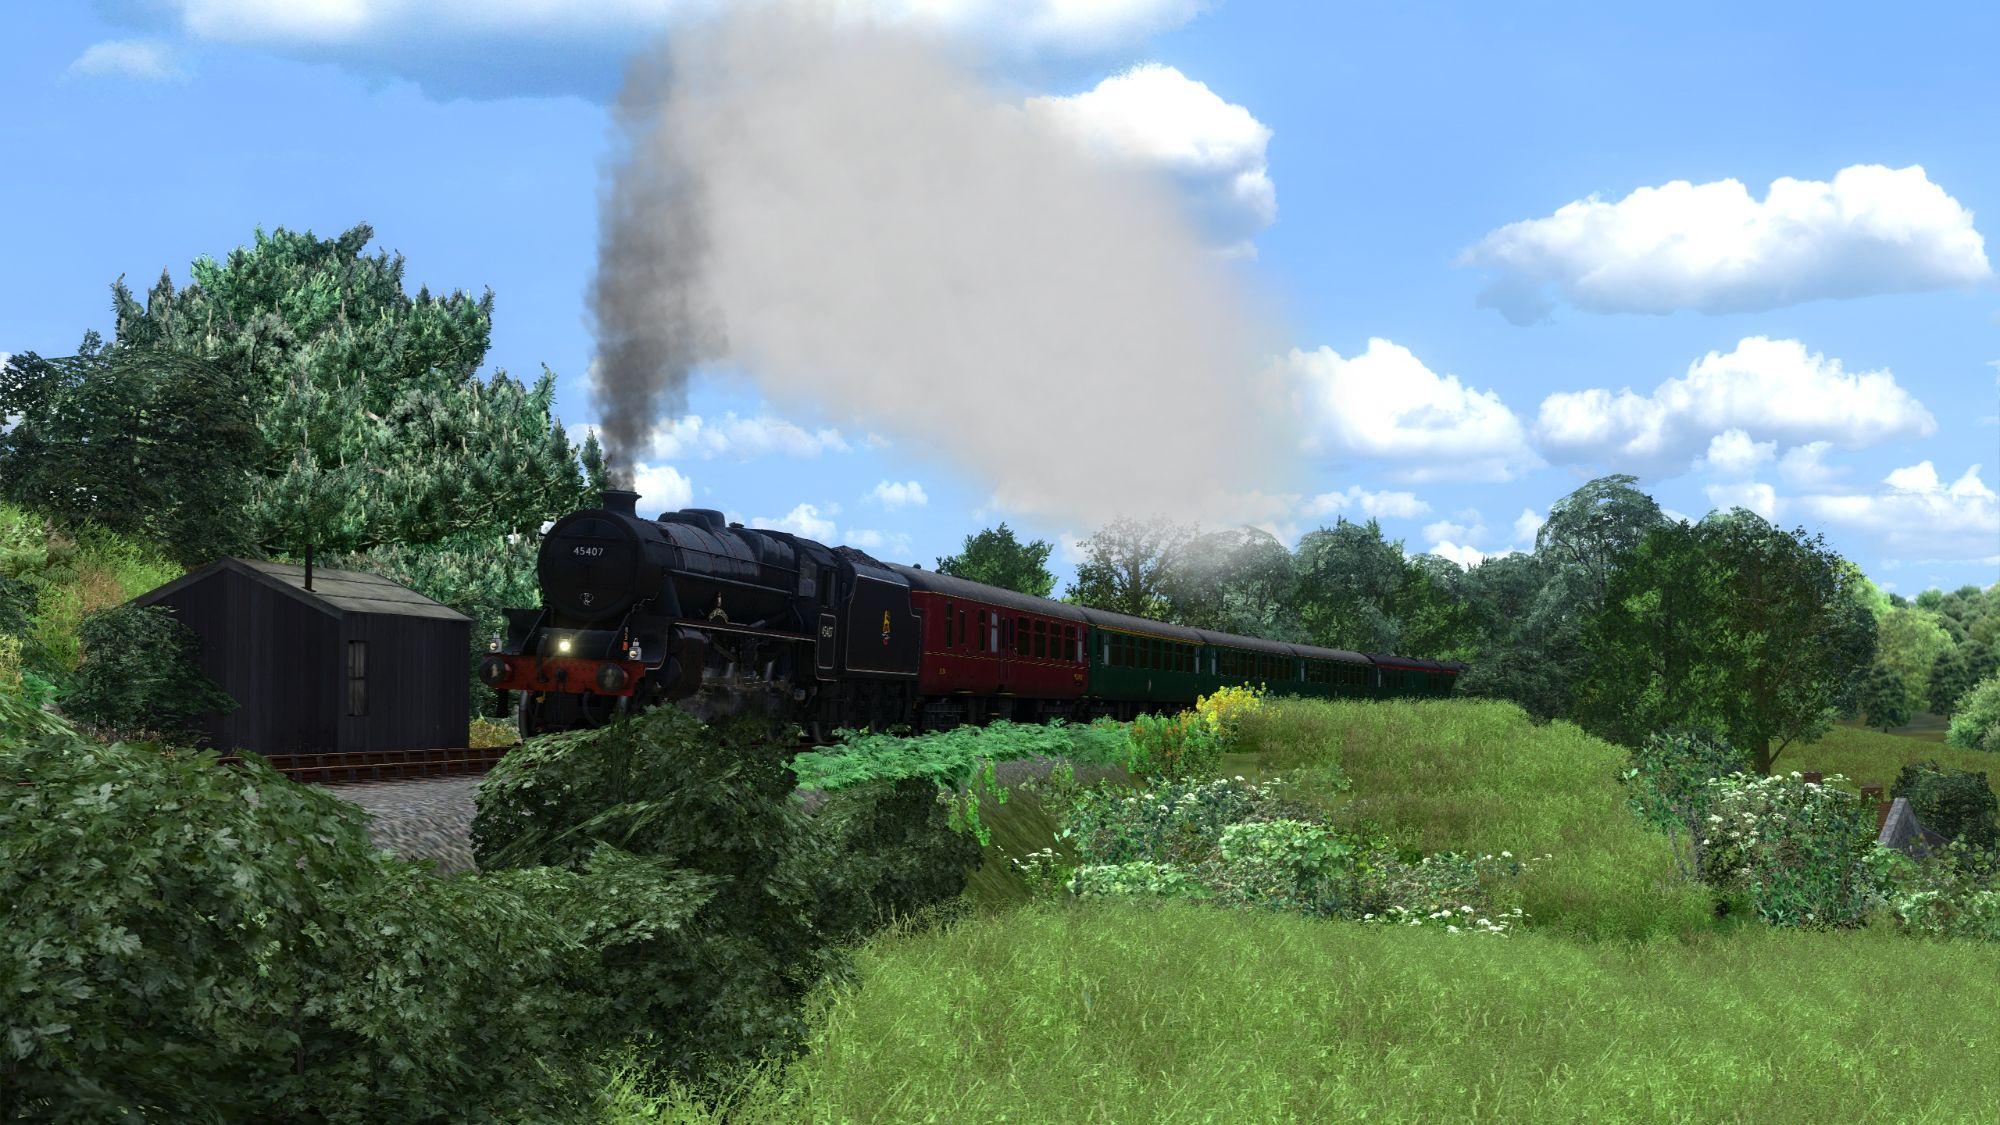 Screenshot_West Somerset Members Edition V4JLW_51.08656--3.21875_12-39-54